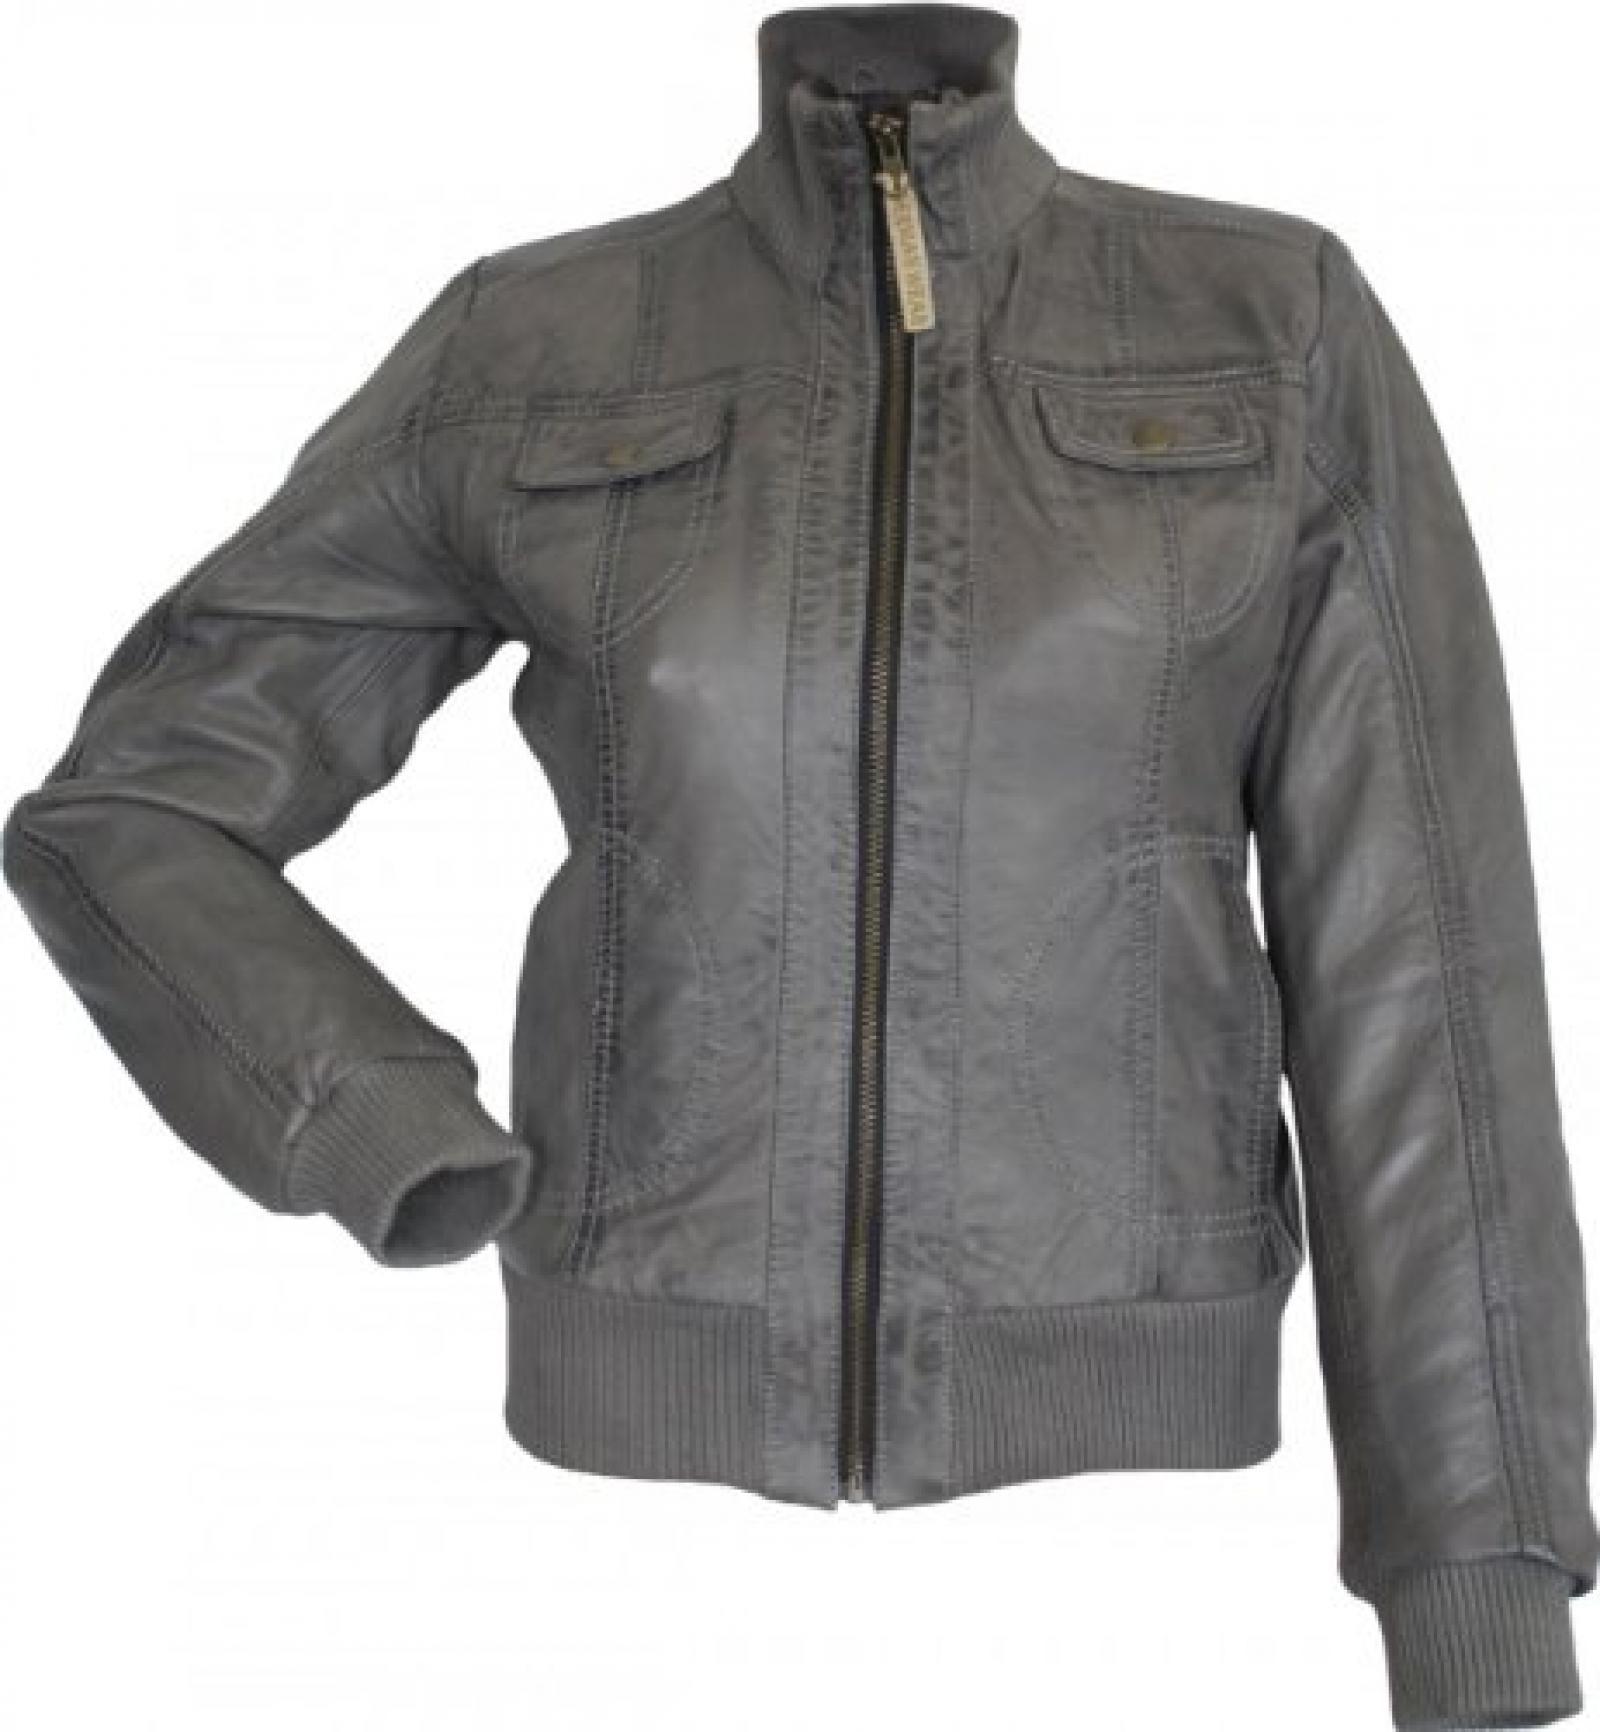 Damen Lederjacke Trend Fashion echtleder Jacke aus Lamm Nappa Leder grau